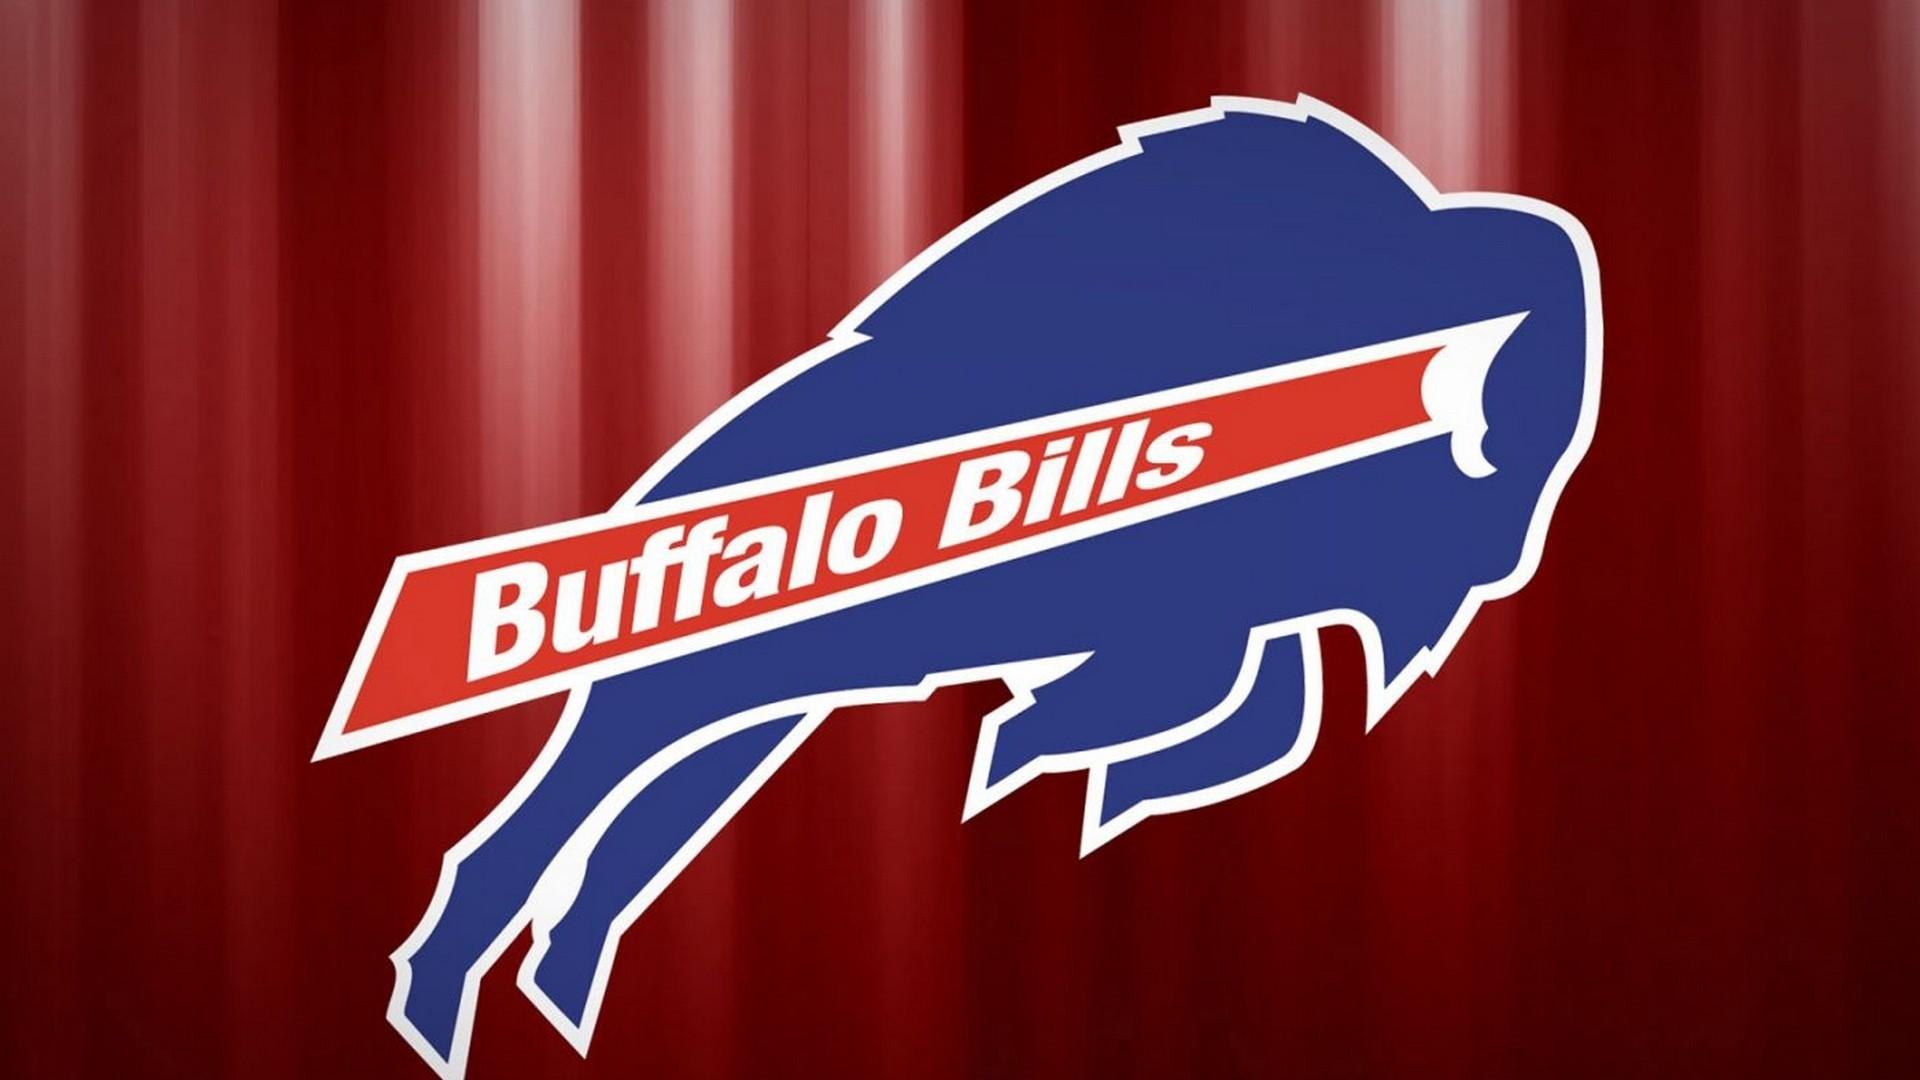 Buffalo Bills Wallpaper image hd